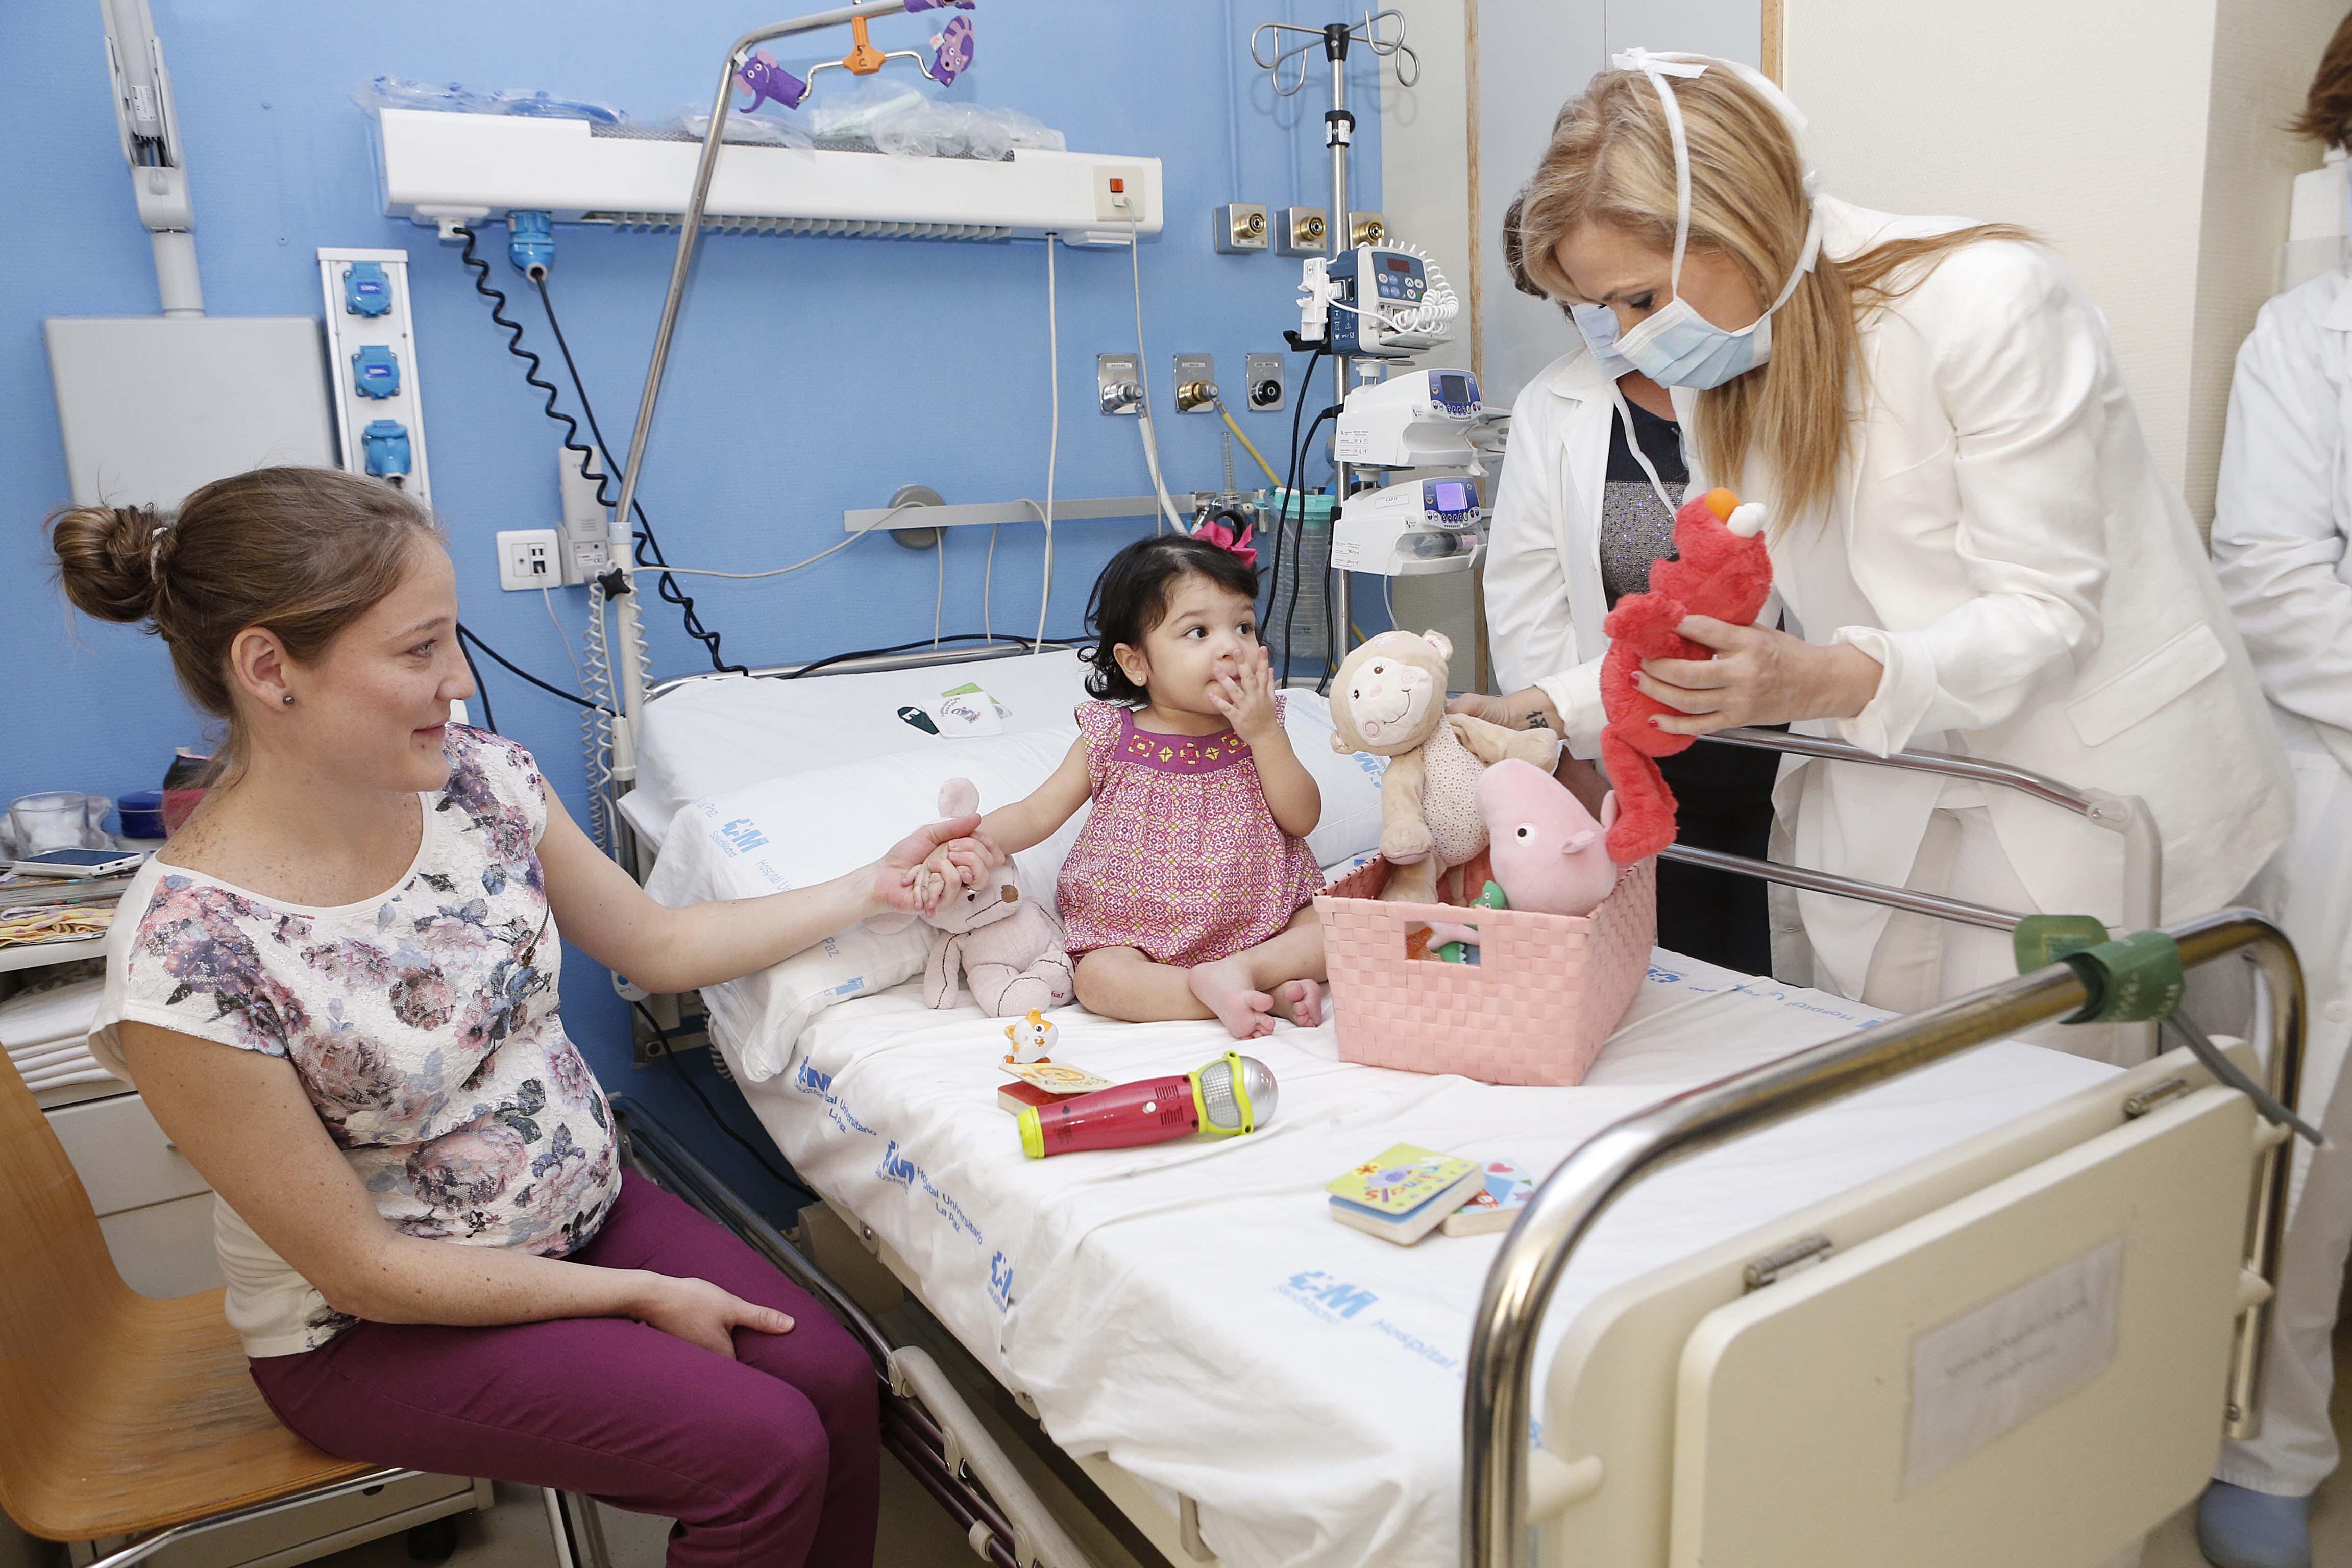 La comunidad de madrid ampliar las urgencias del hospital - Hospital materno infantil la paz ...